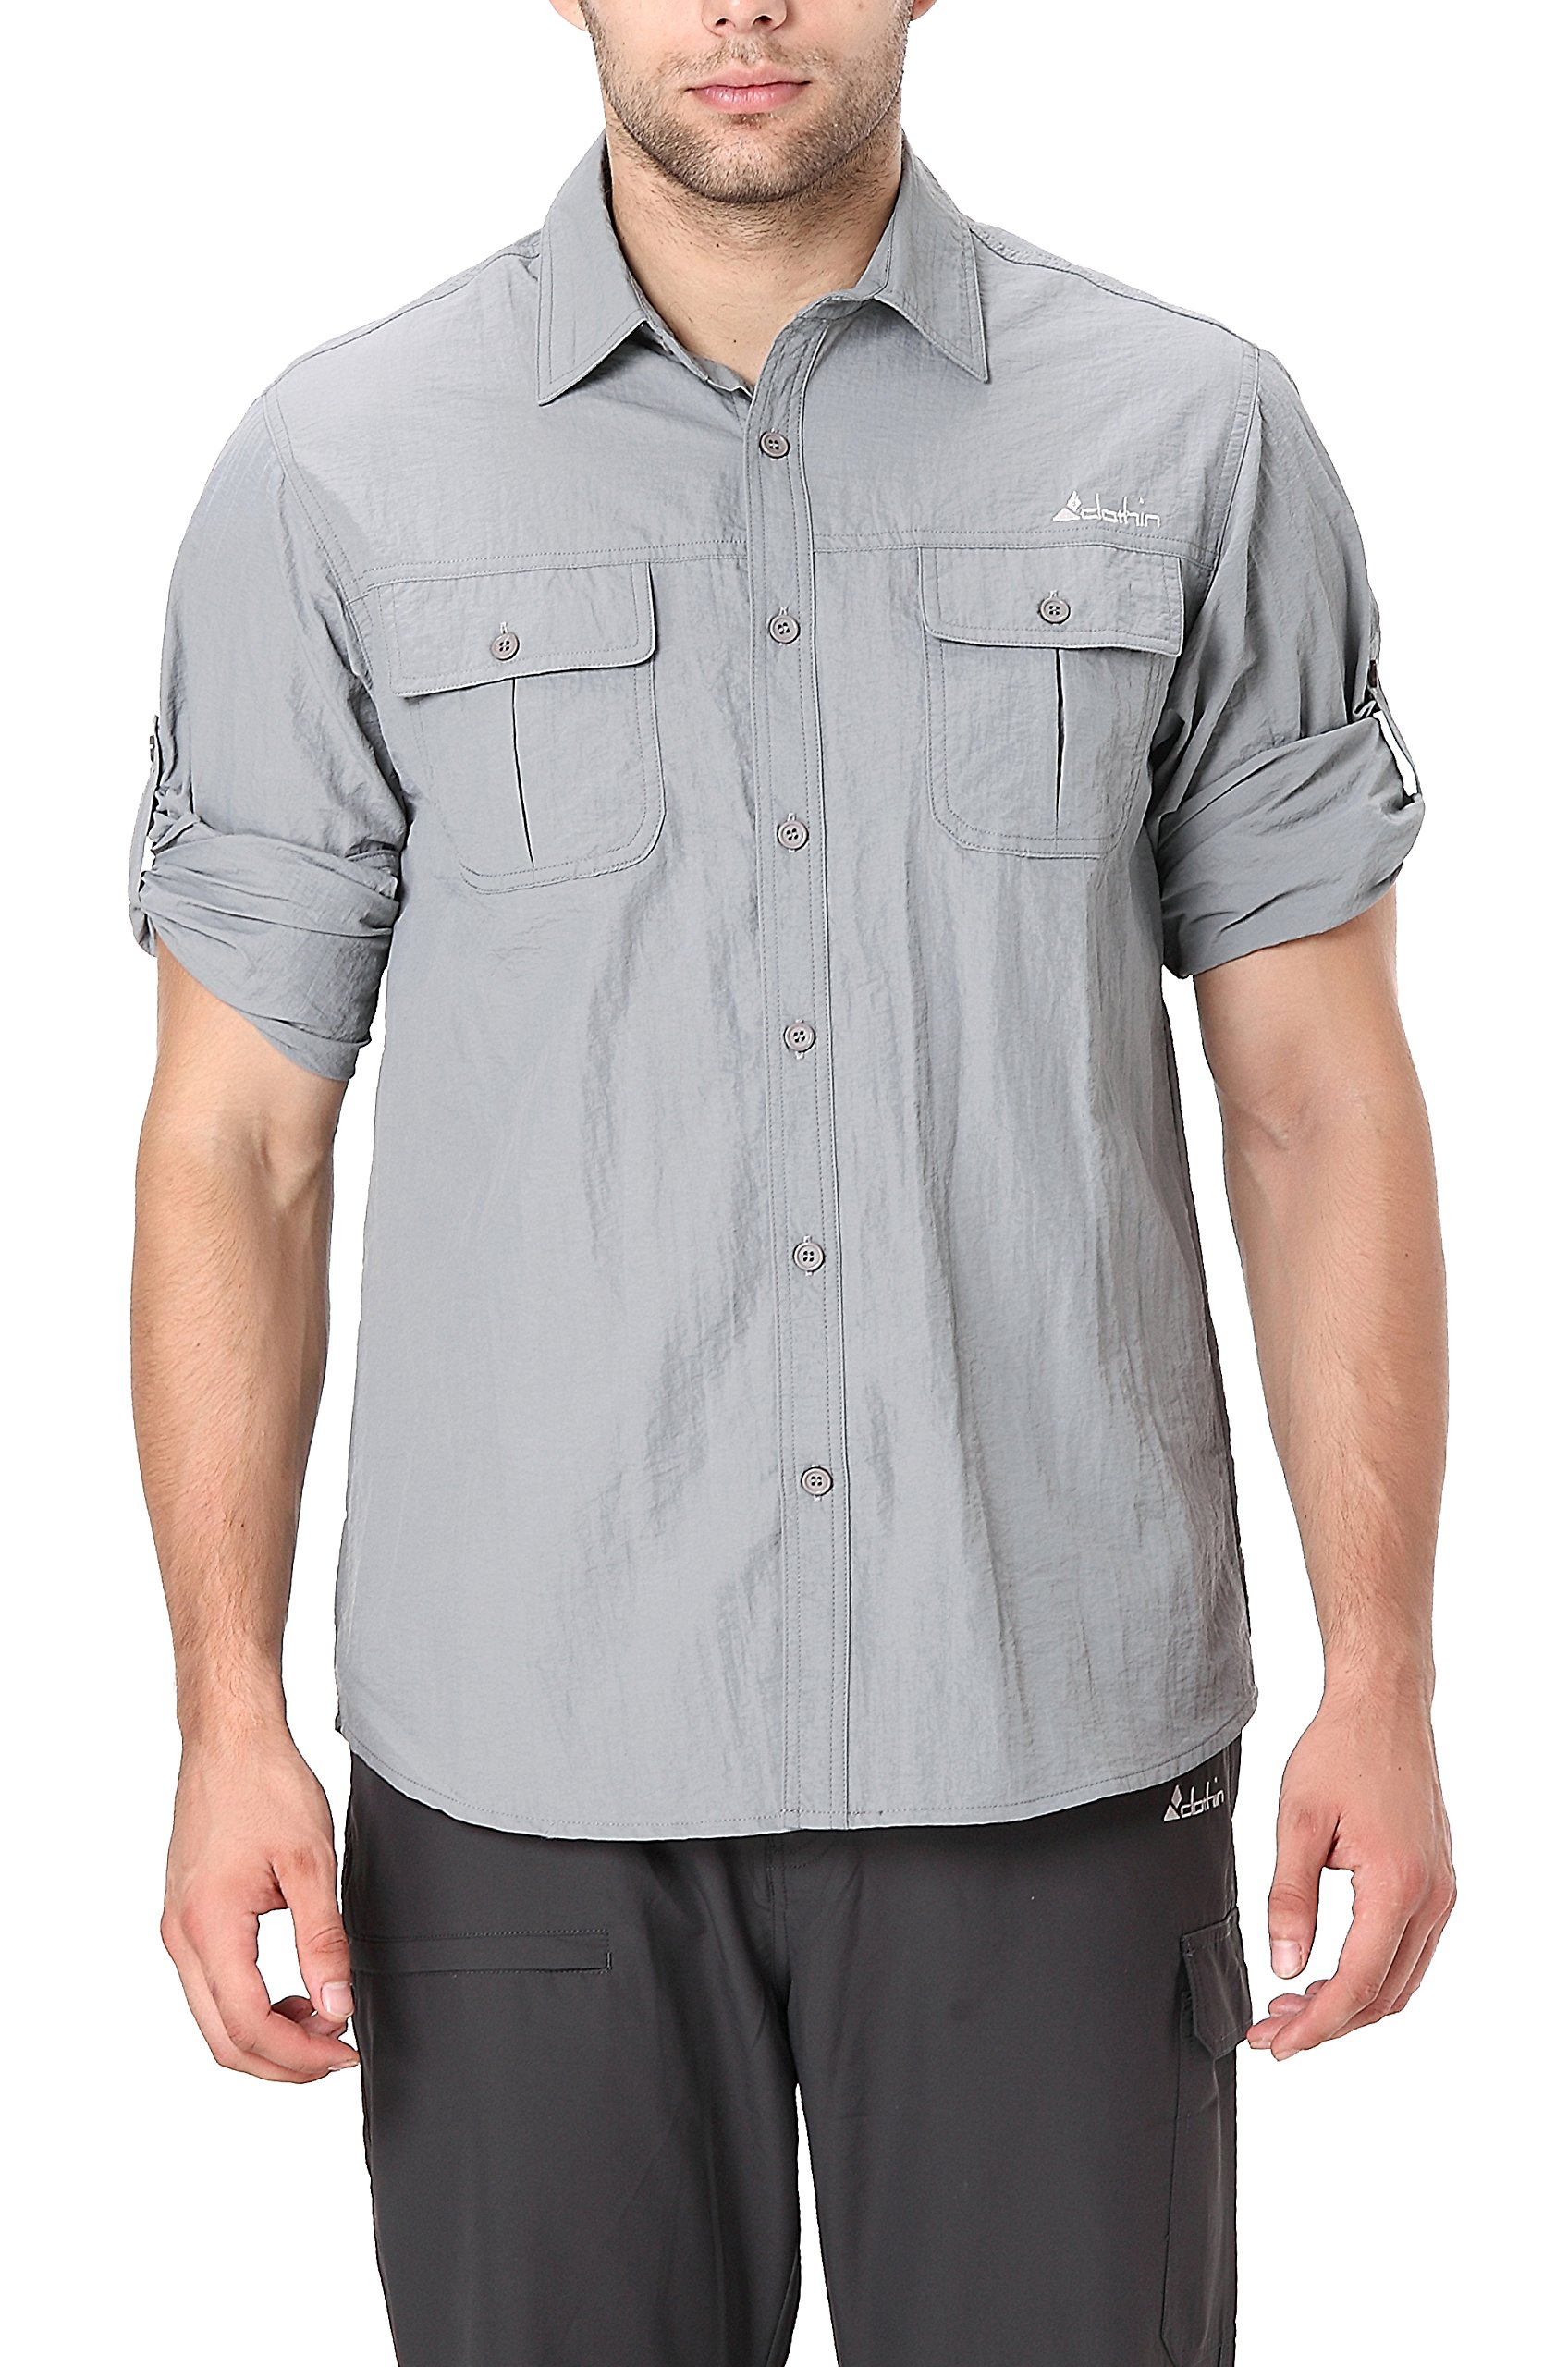 Clothin Men's Roll-Up Long Sleeve Vented Shirt - Lightweight Cooling Quick-Dry,Grey,Medium